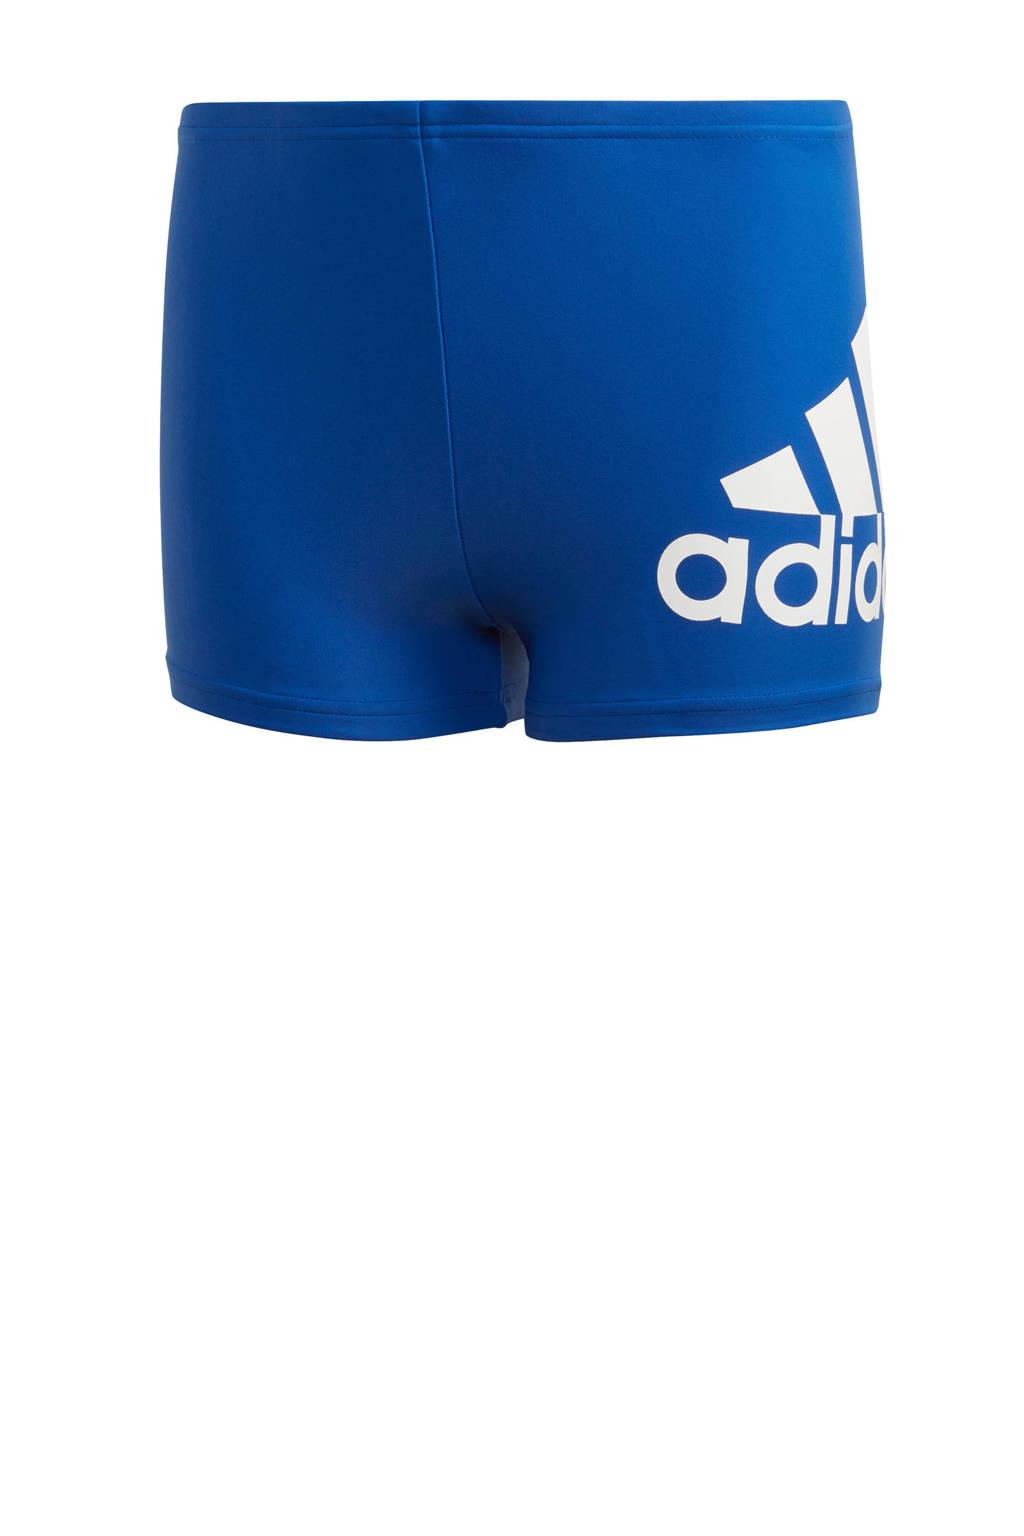 adidas Performance zwemboxer blauw, Blauw/wit